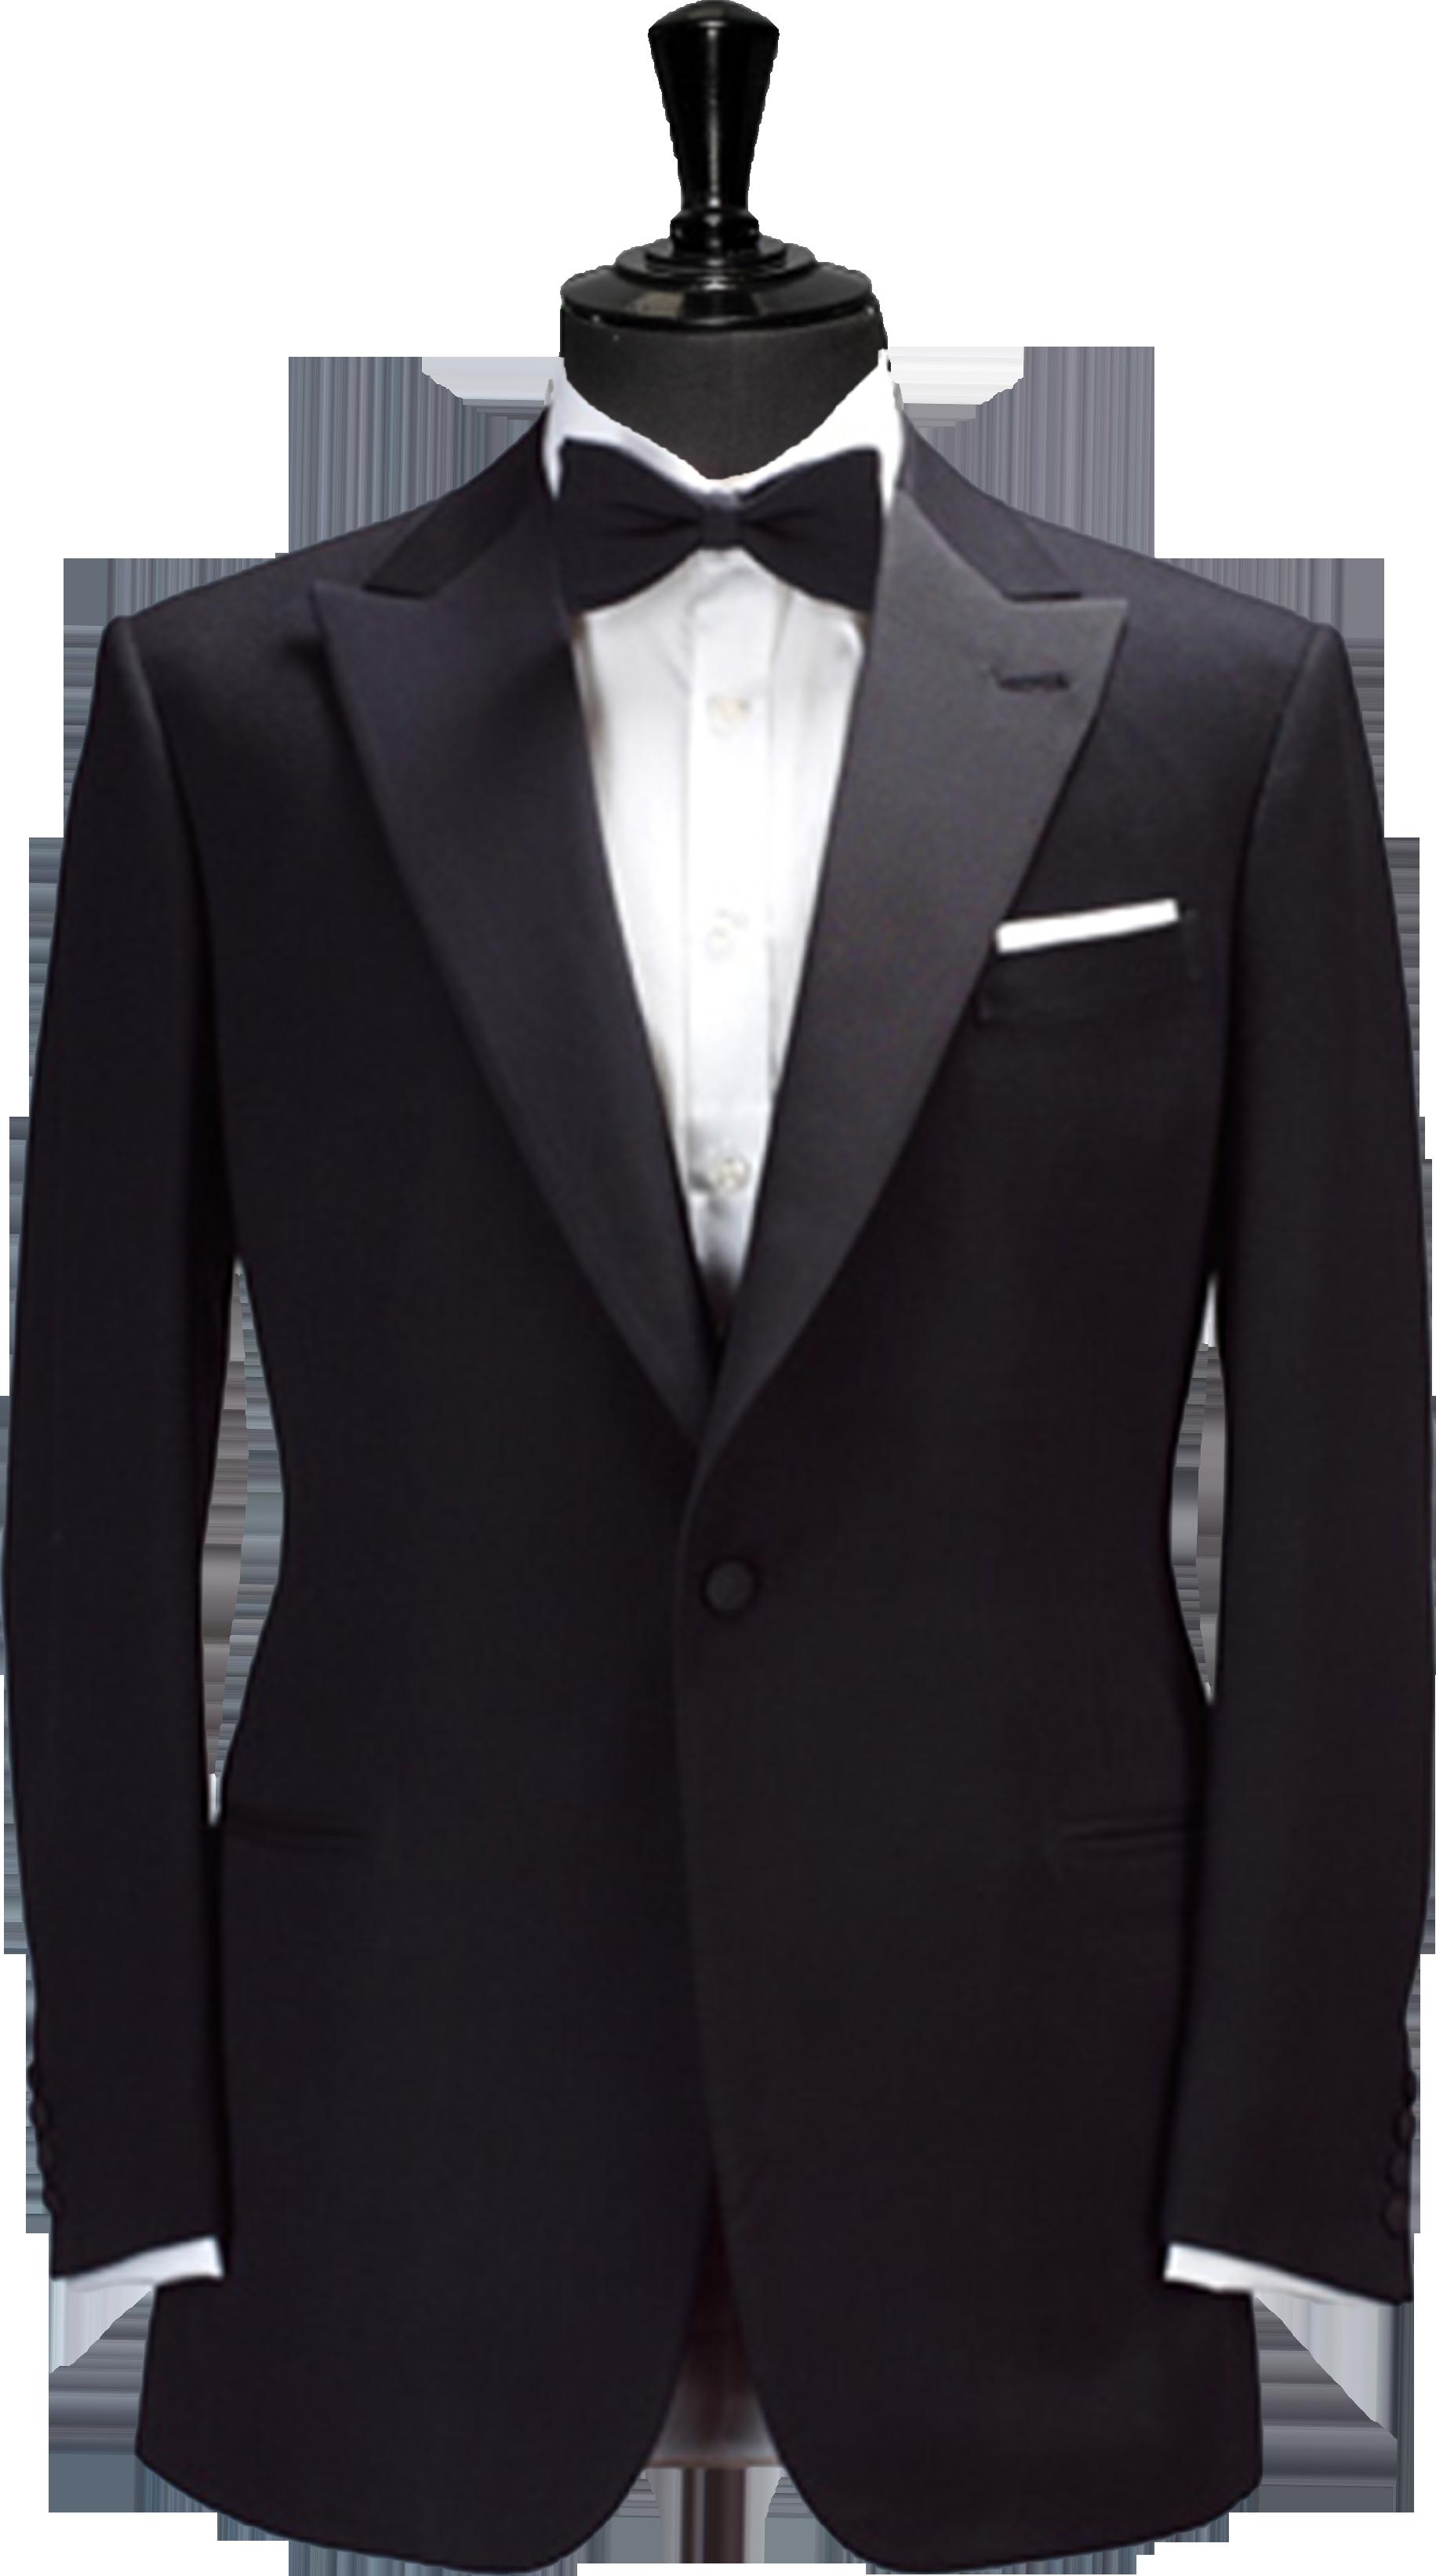 clip art royalty free stock transparent suit tuxedo #117450585